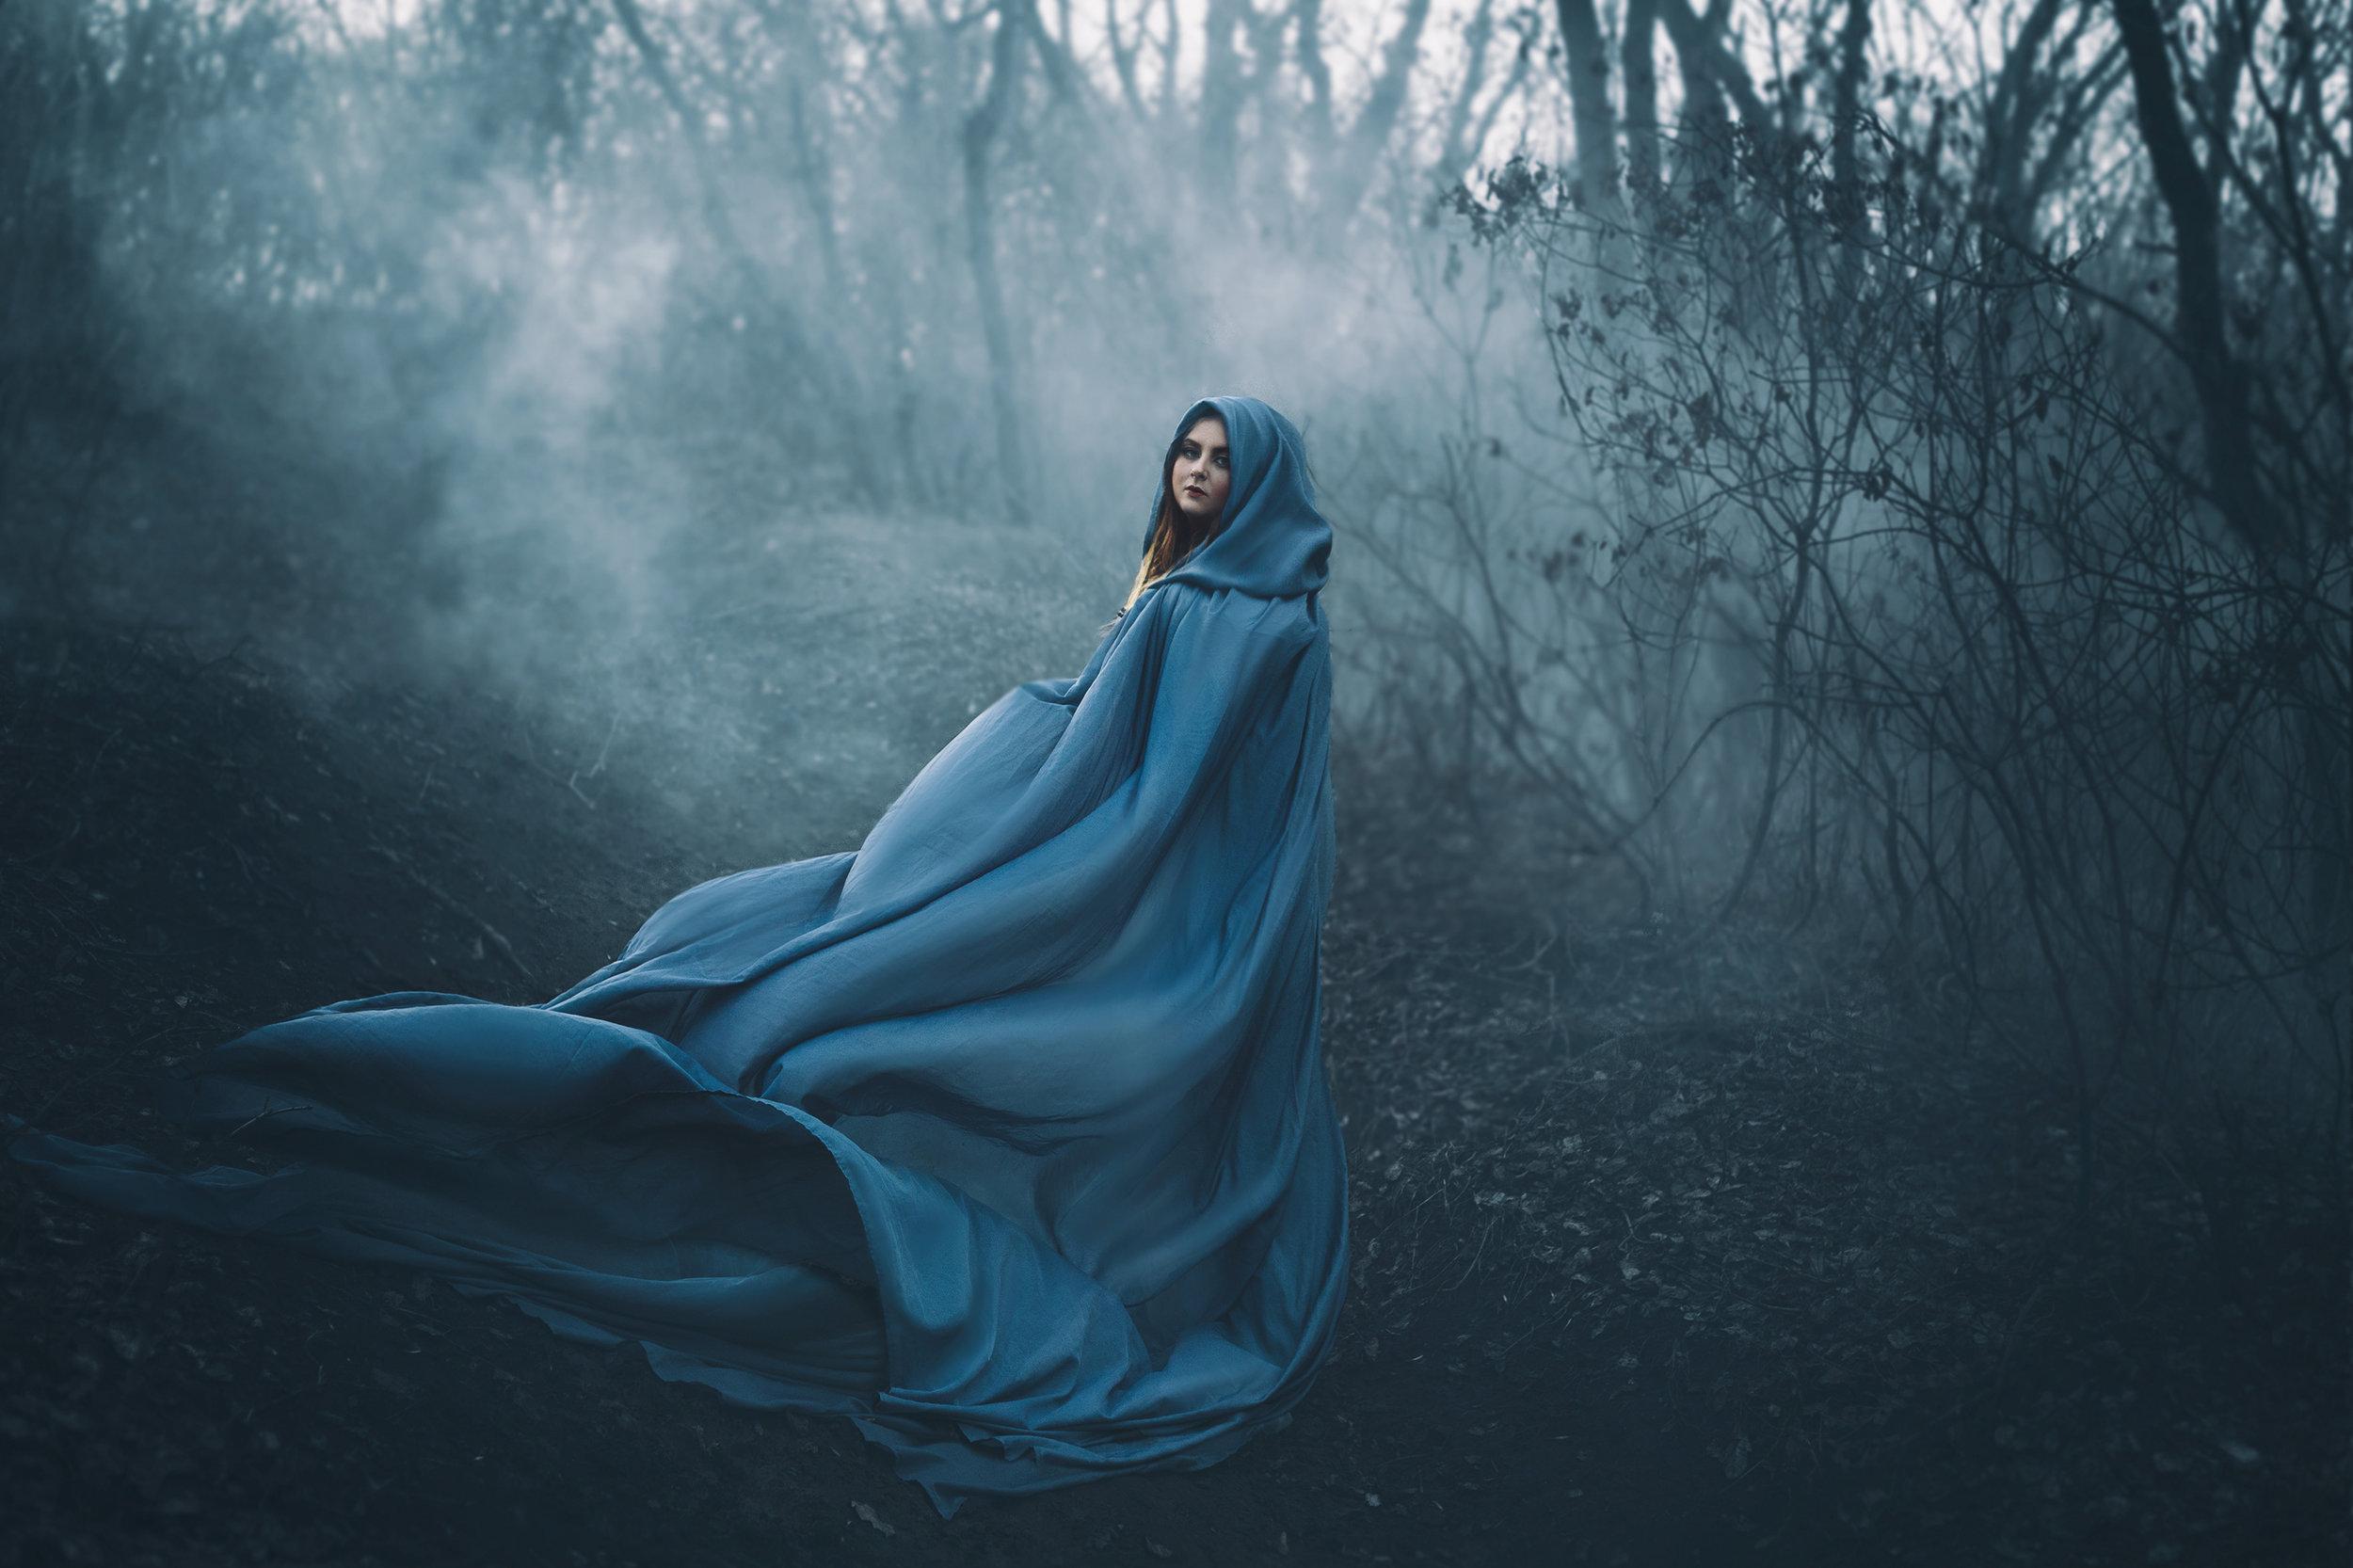 She is mystical -